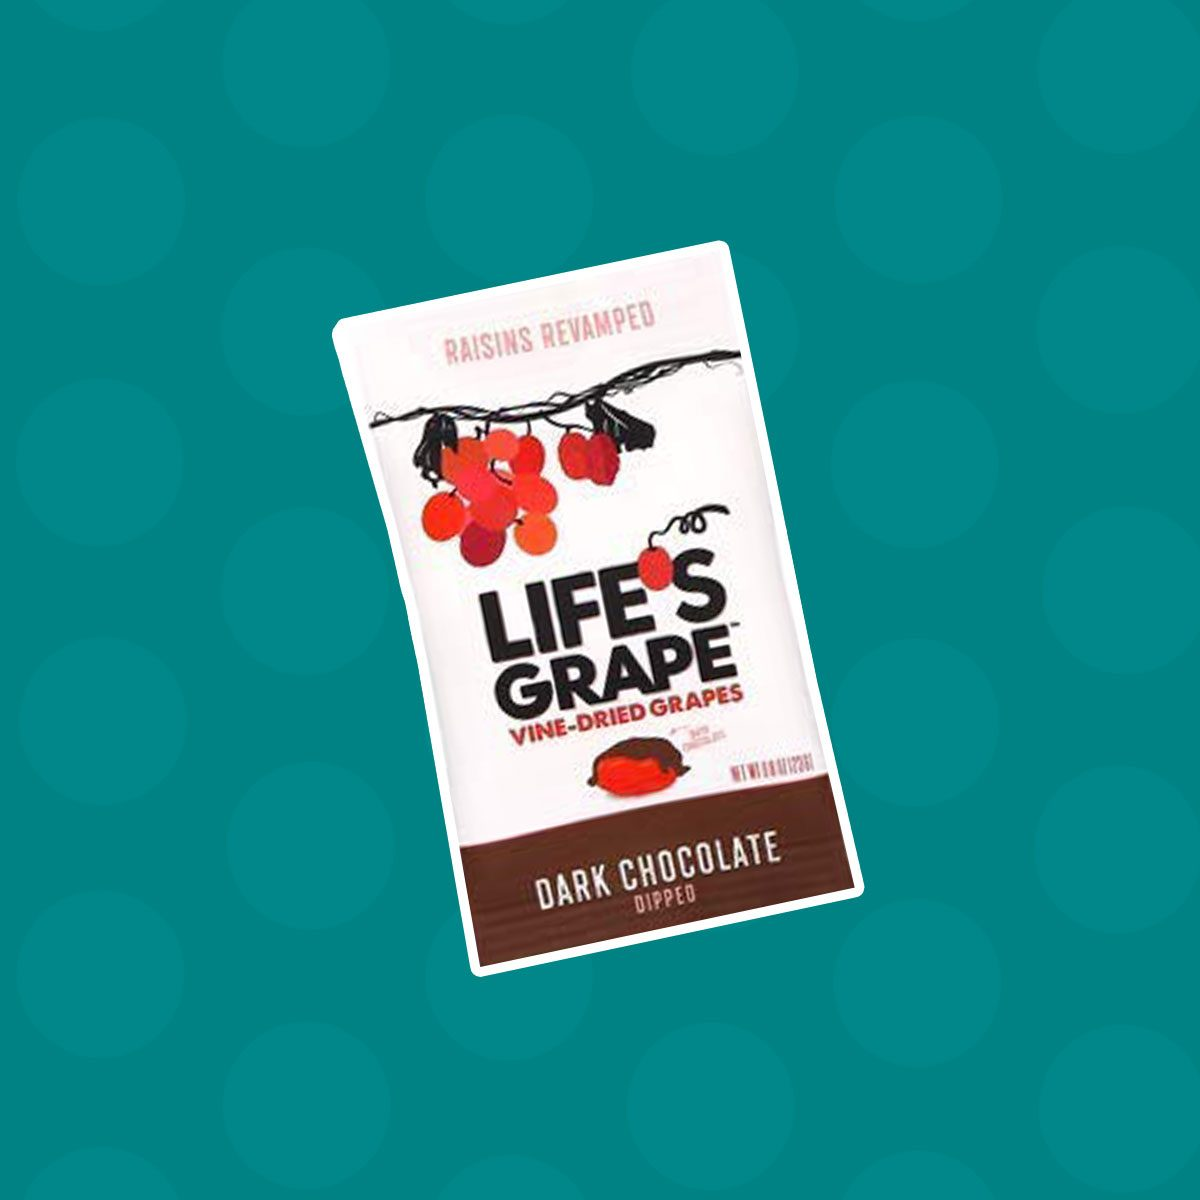 Life's Grape Vine Dried Grapes - Dark Chocolate